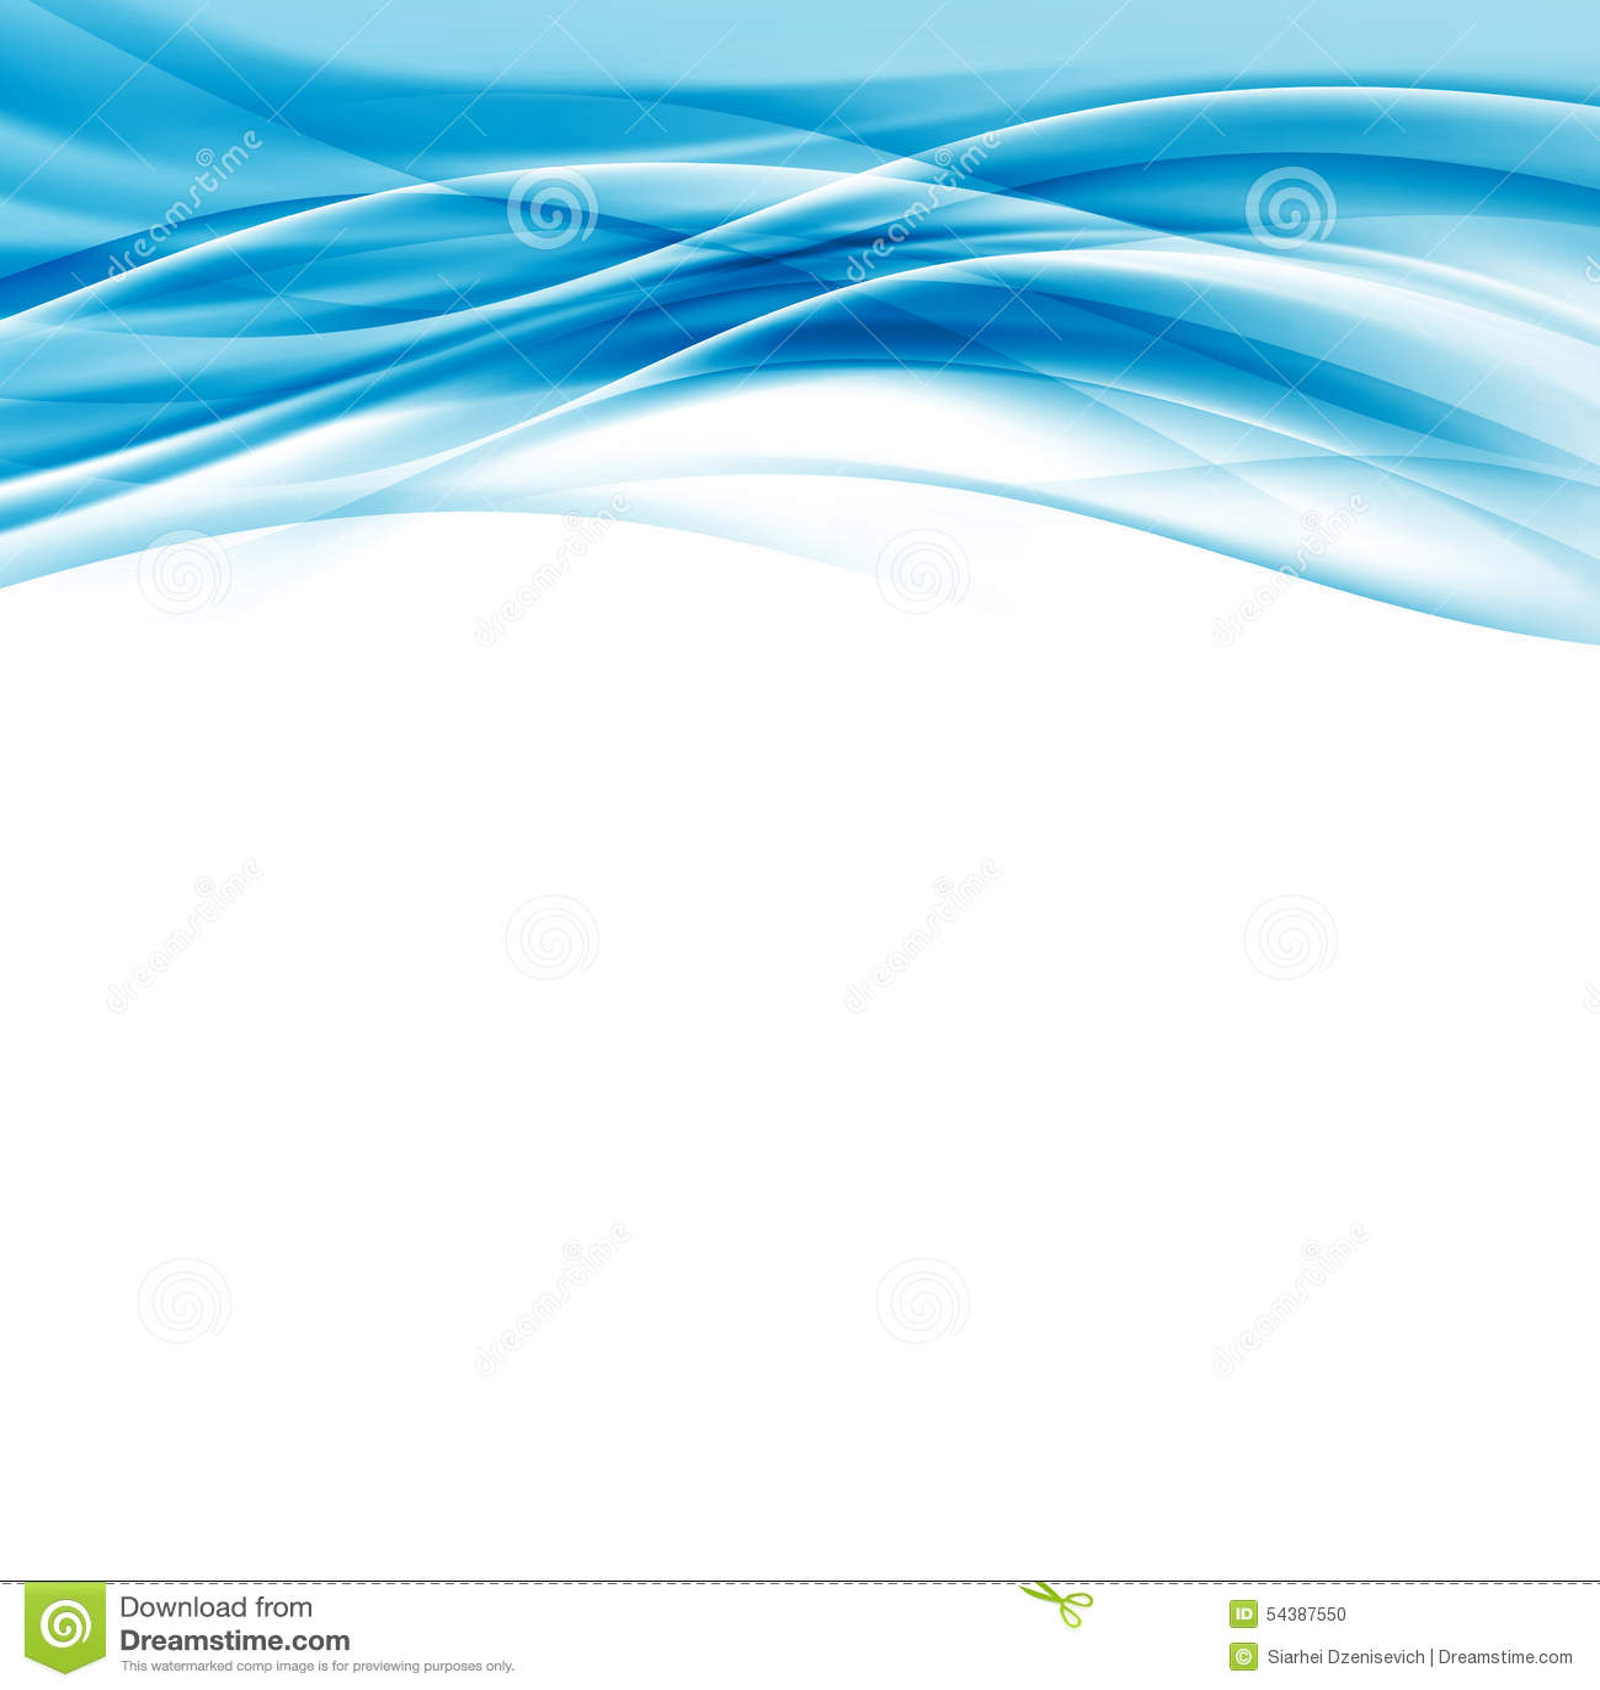 contemporary abstract blue wave border hi